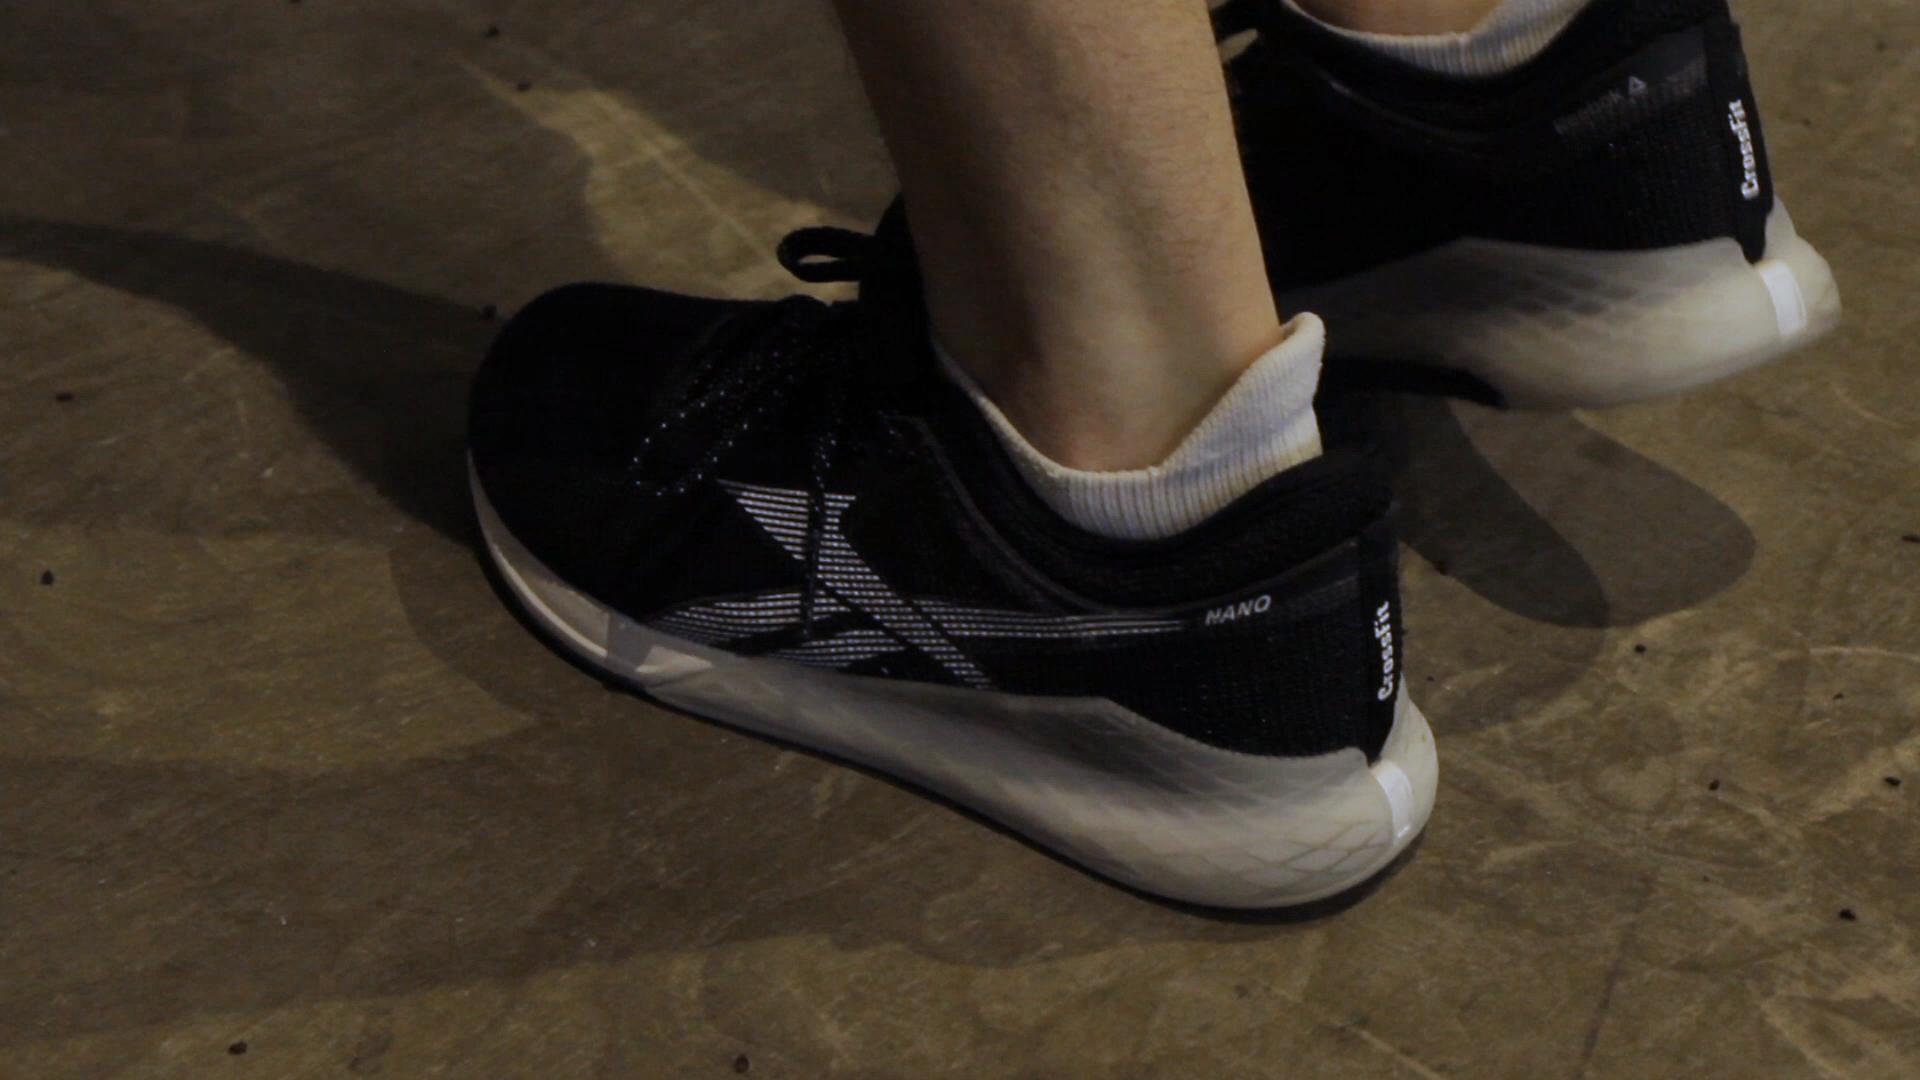 Reebok Nano 9 On Feet